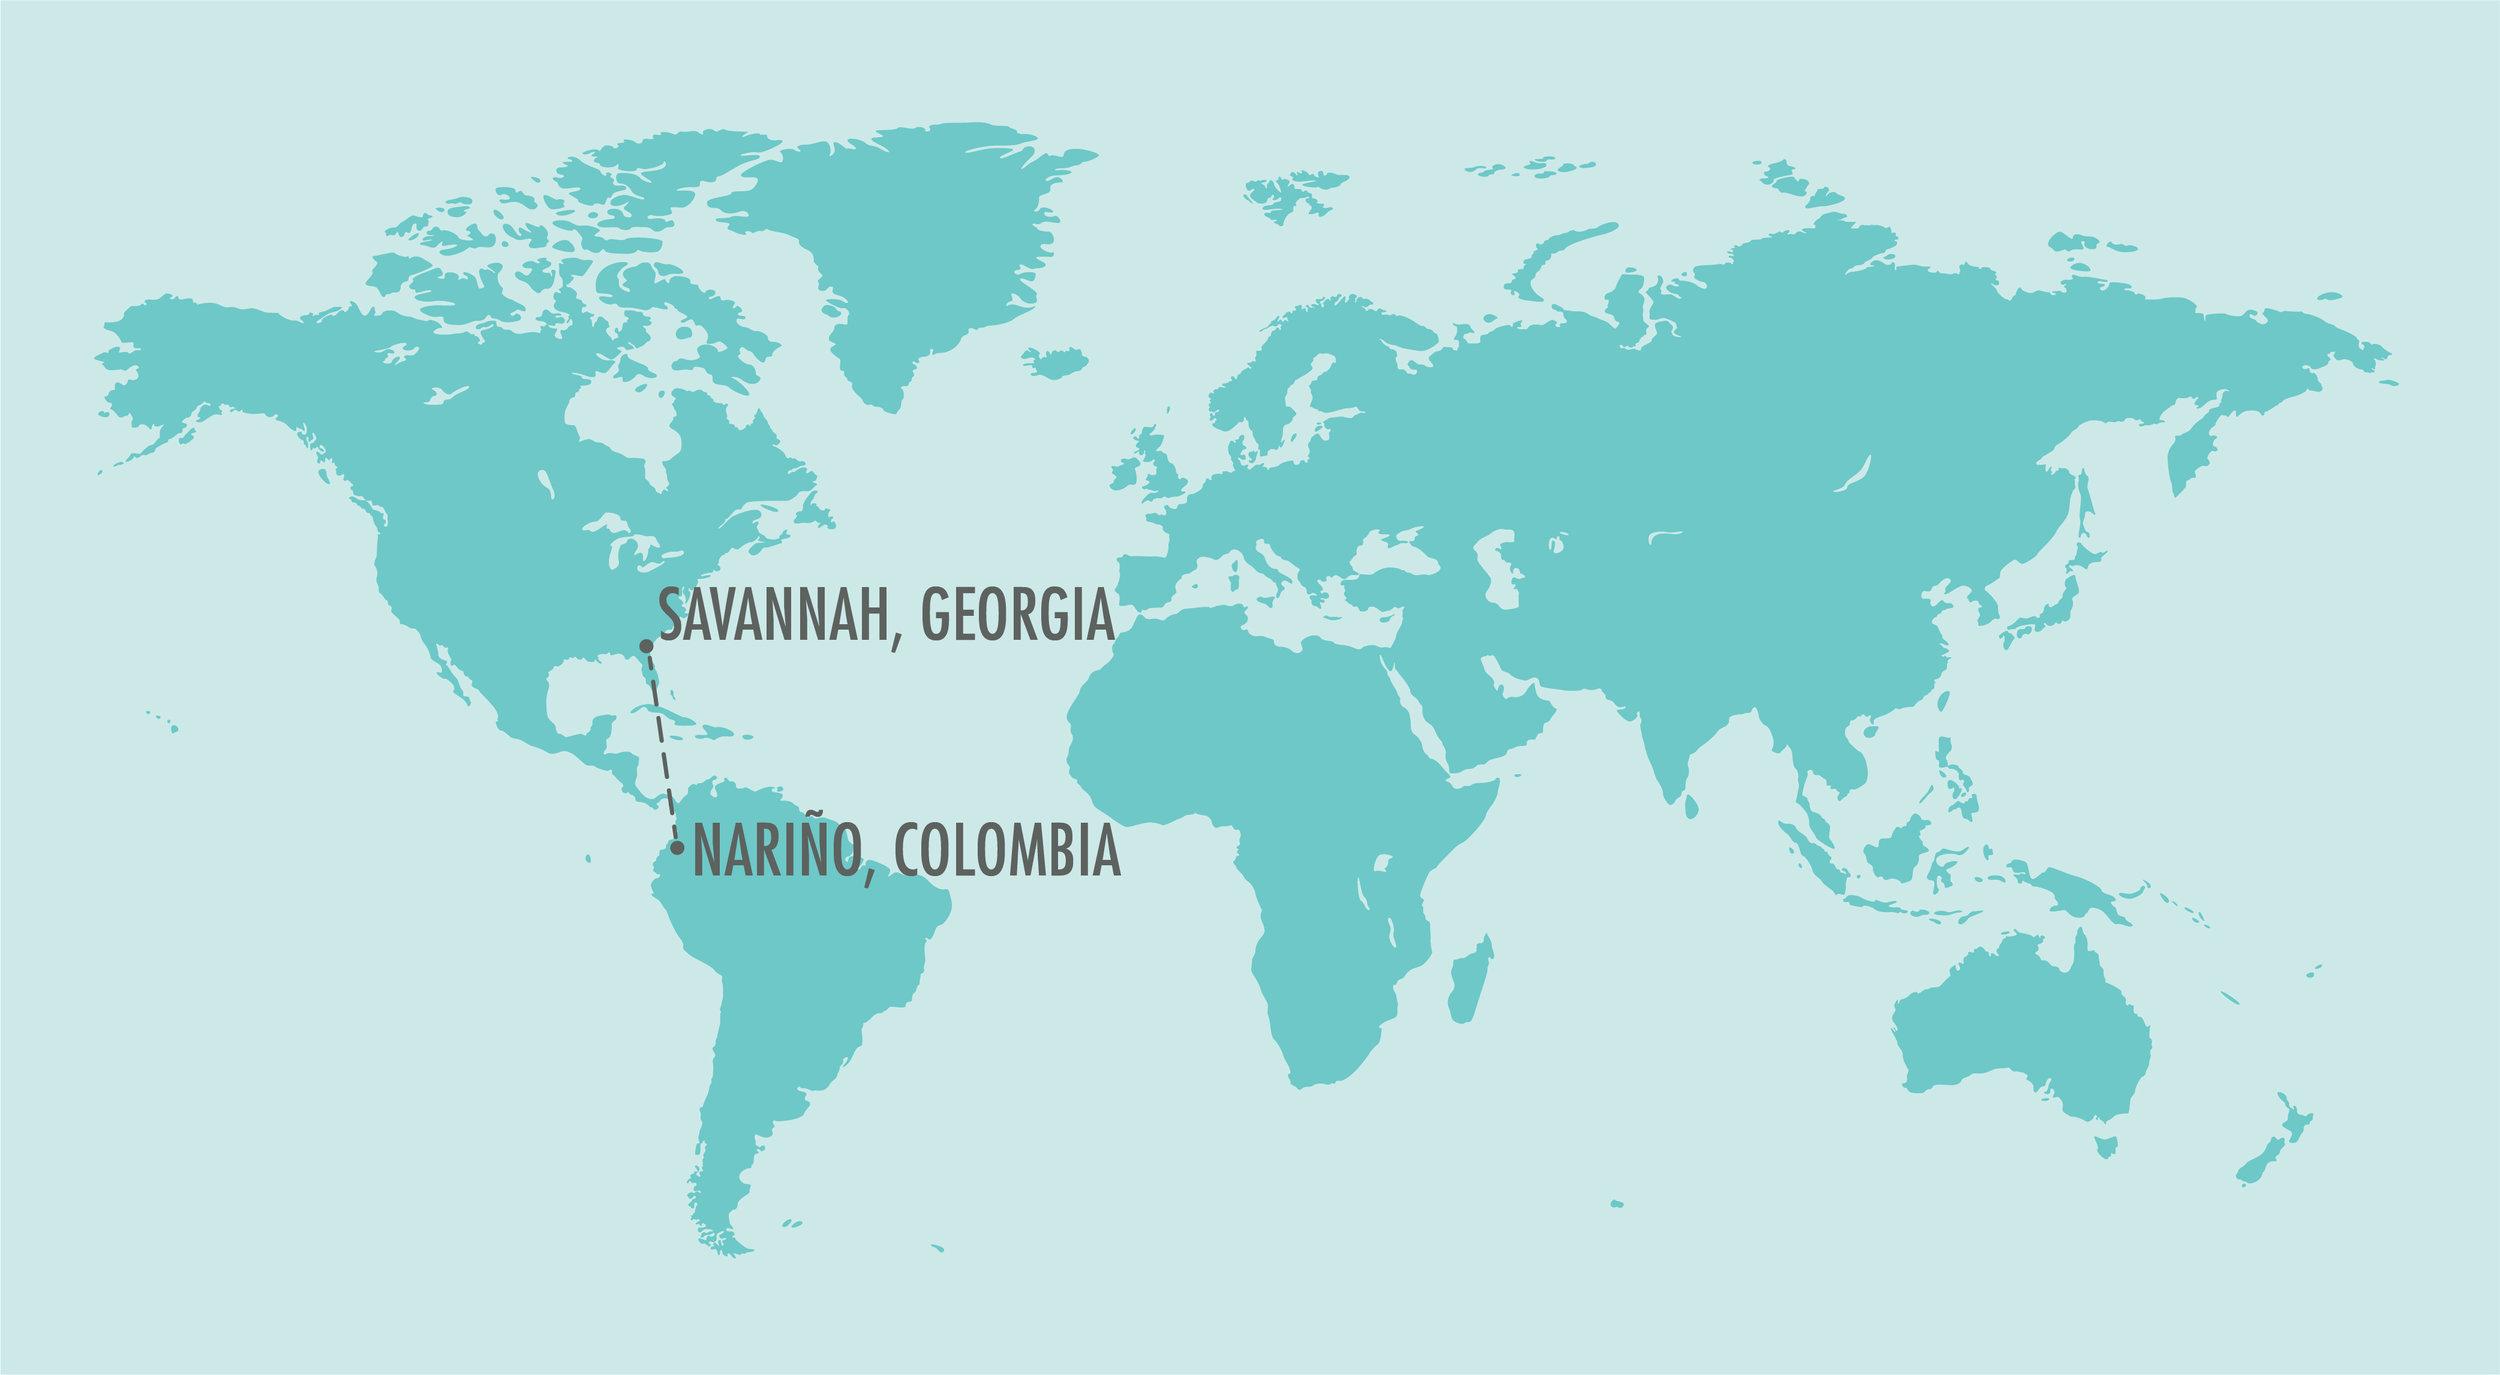 map_colombia_narino.jpg